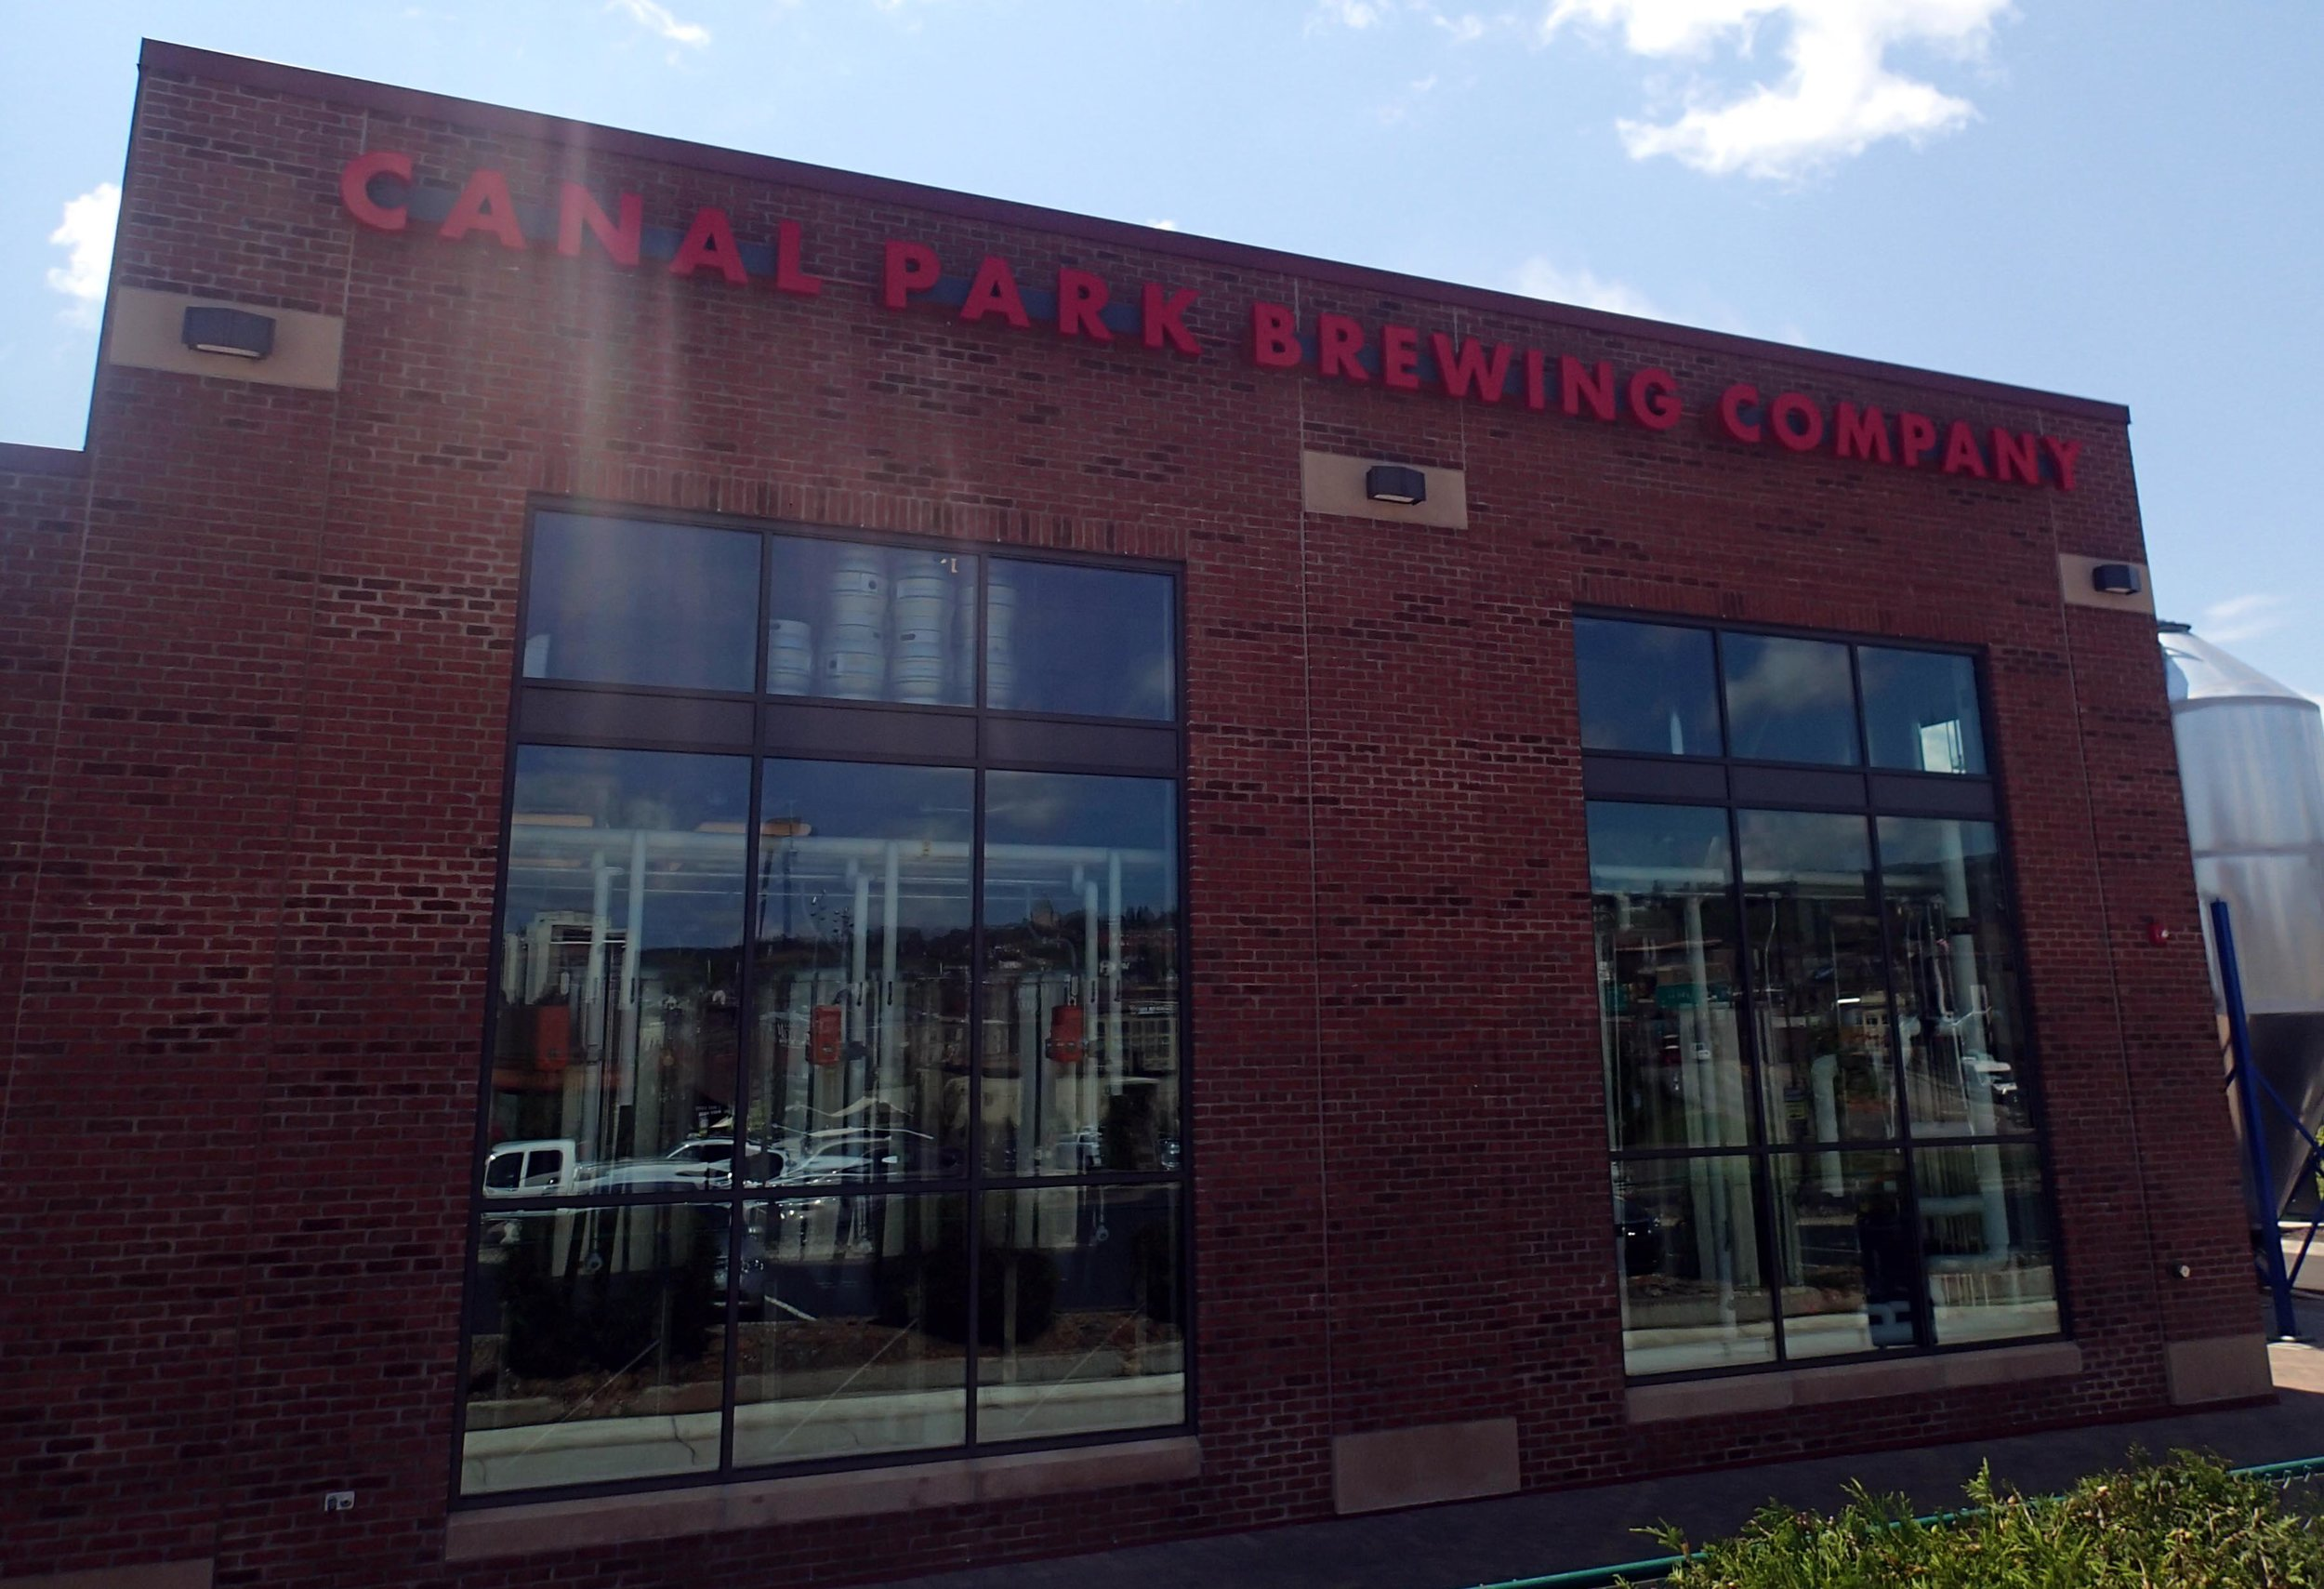 Canal Park Brewing Park.jpg